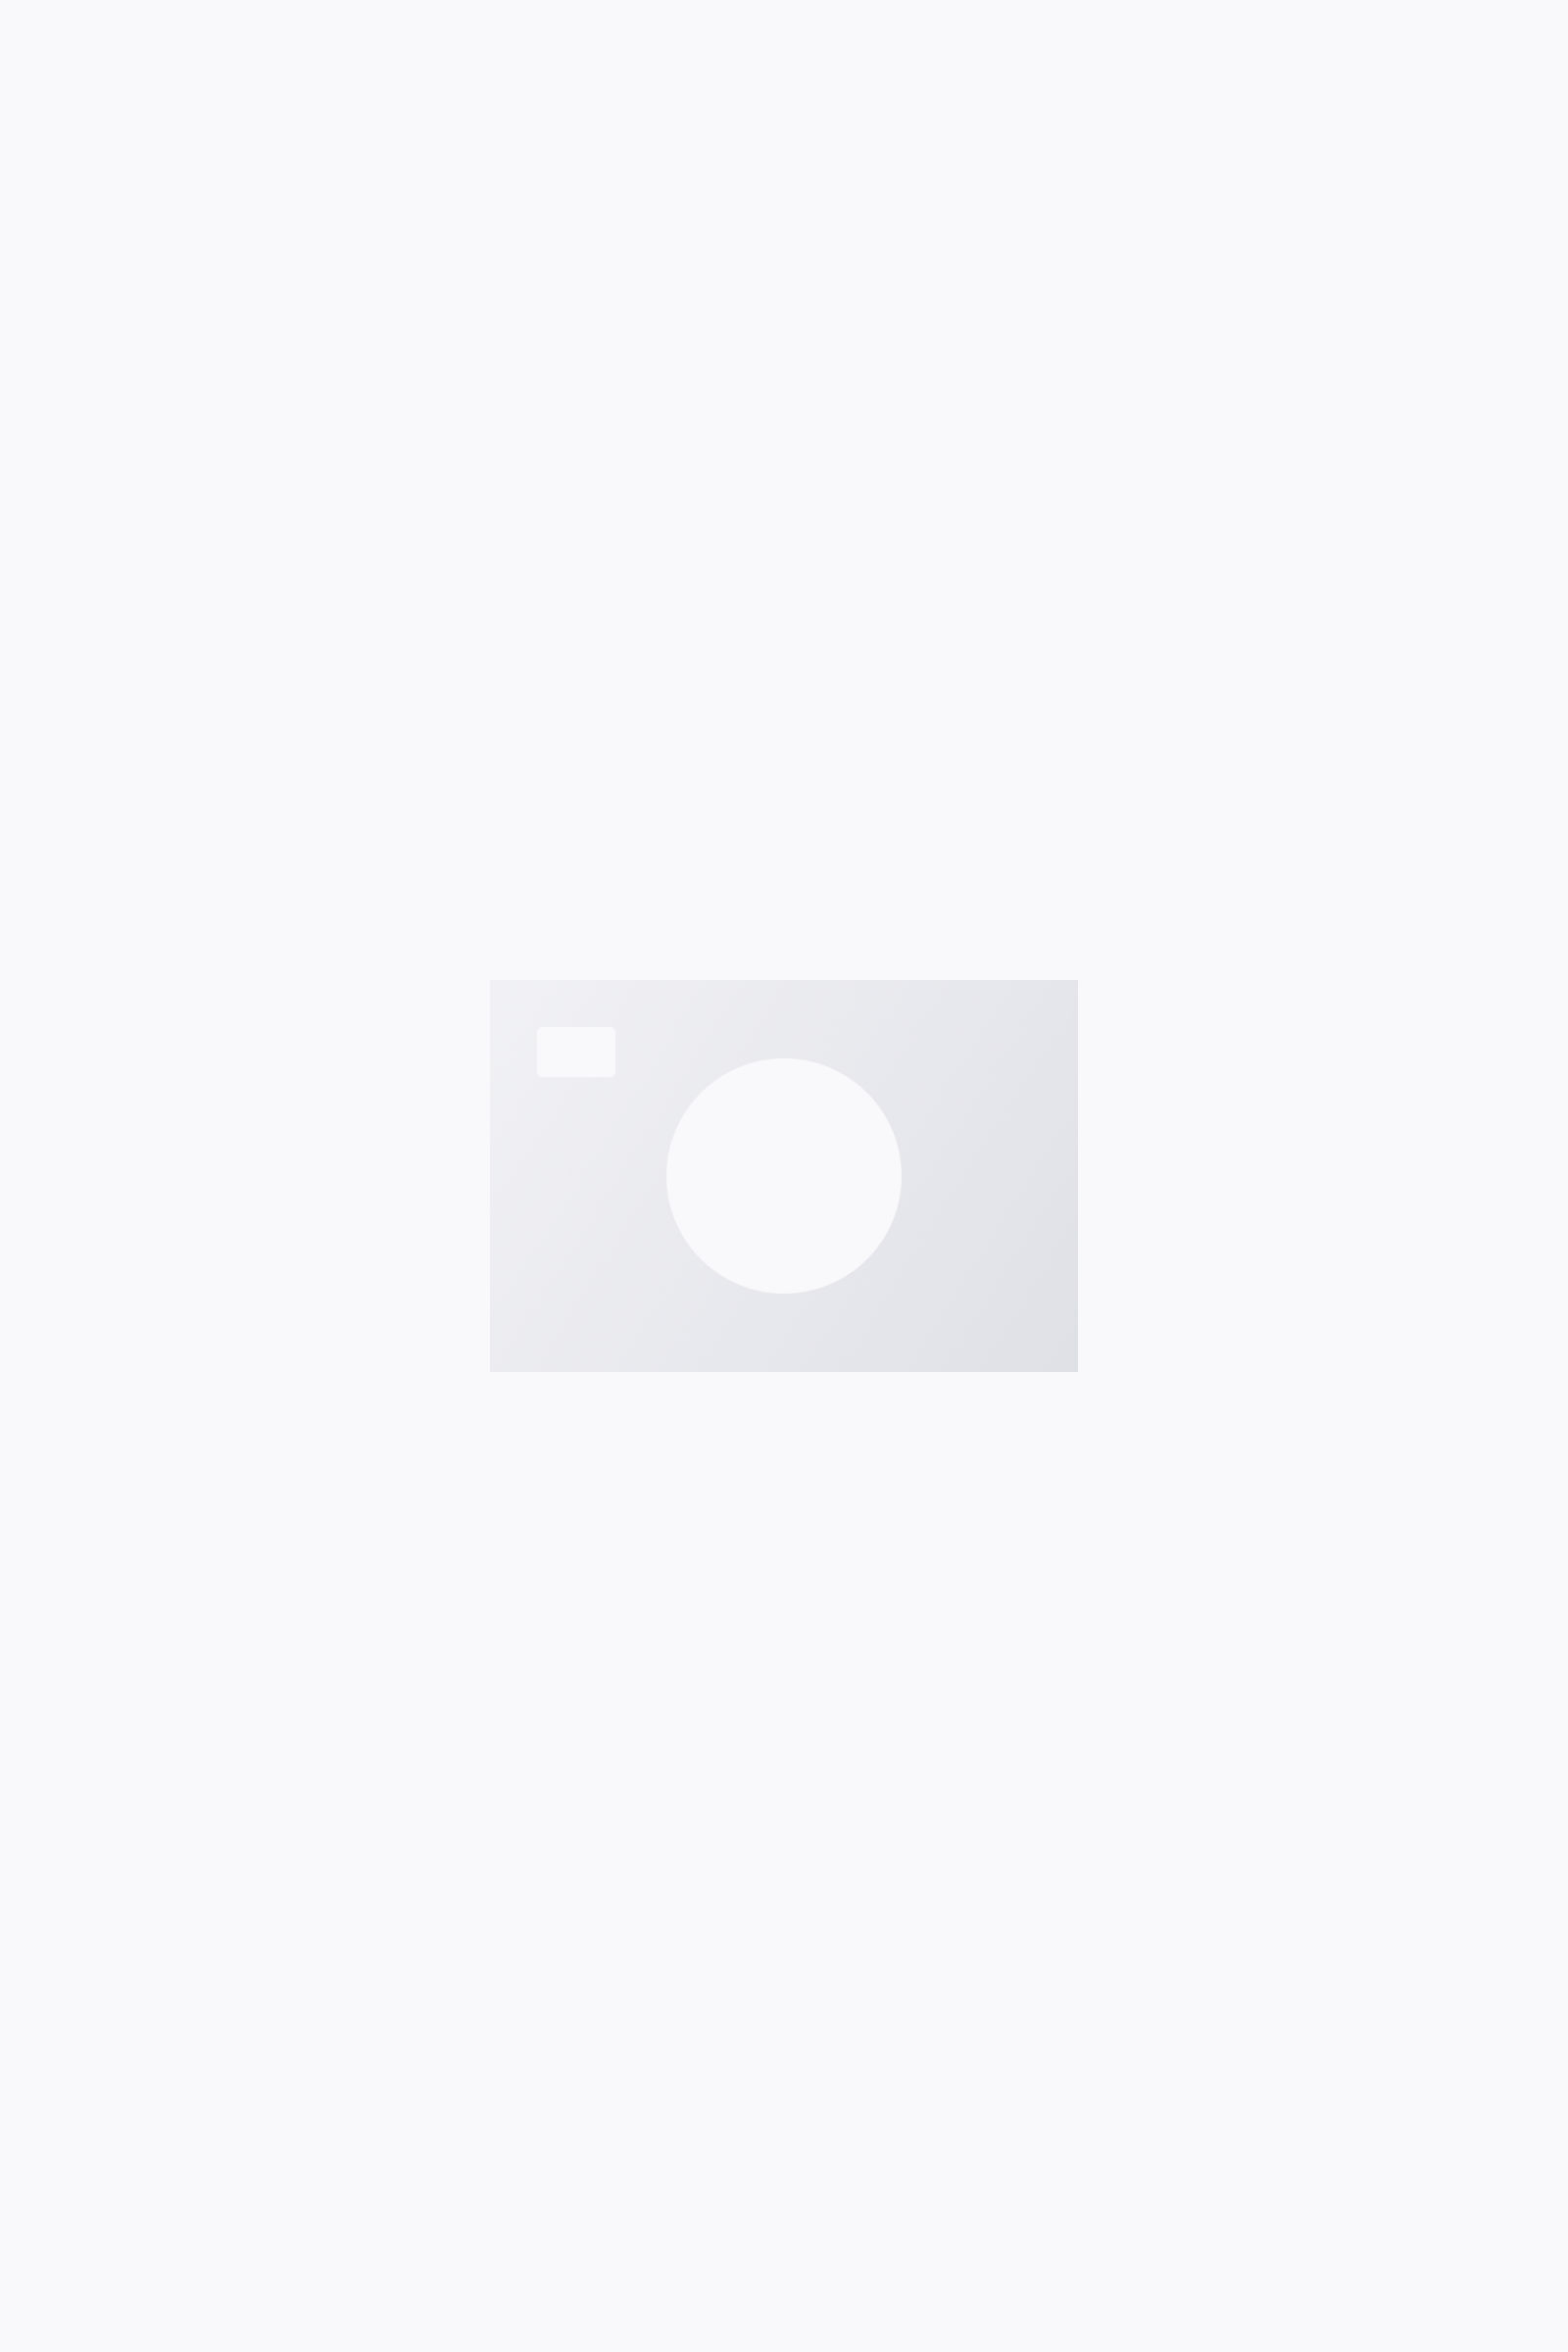 COS REGULAR-FIT STRIPED T-SHIRT,black / white / blue